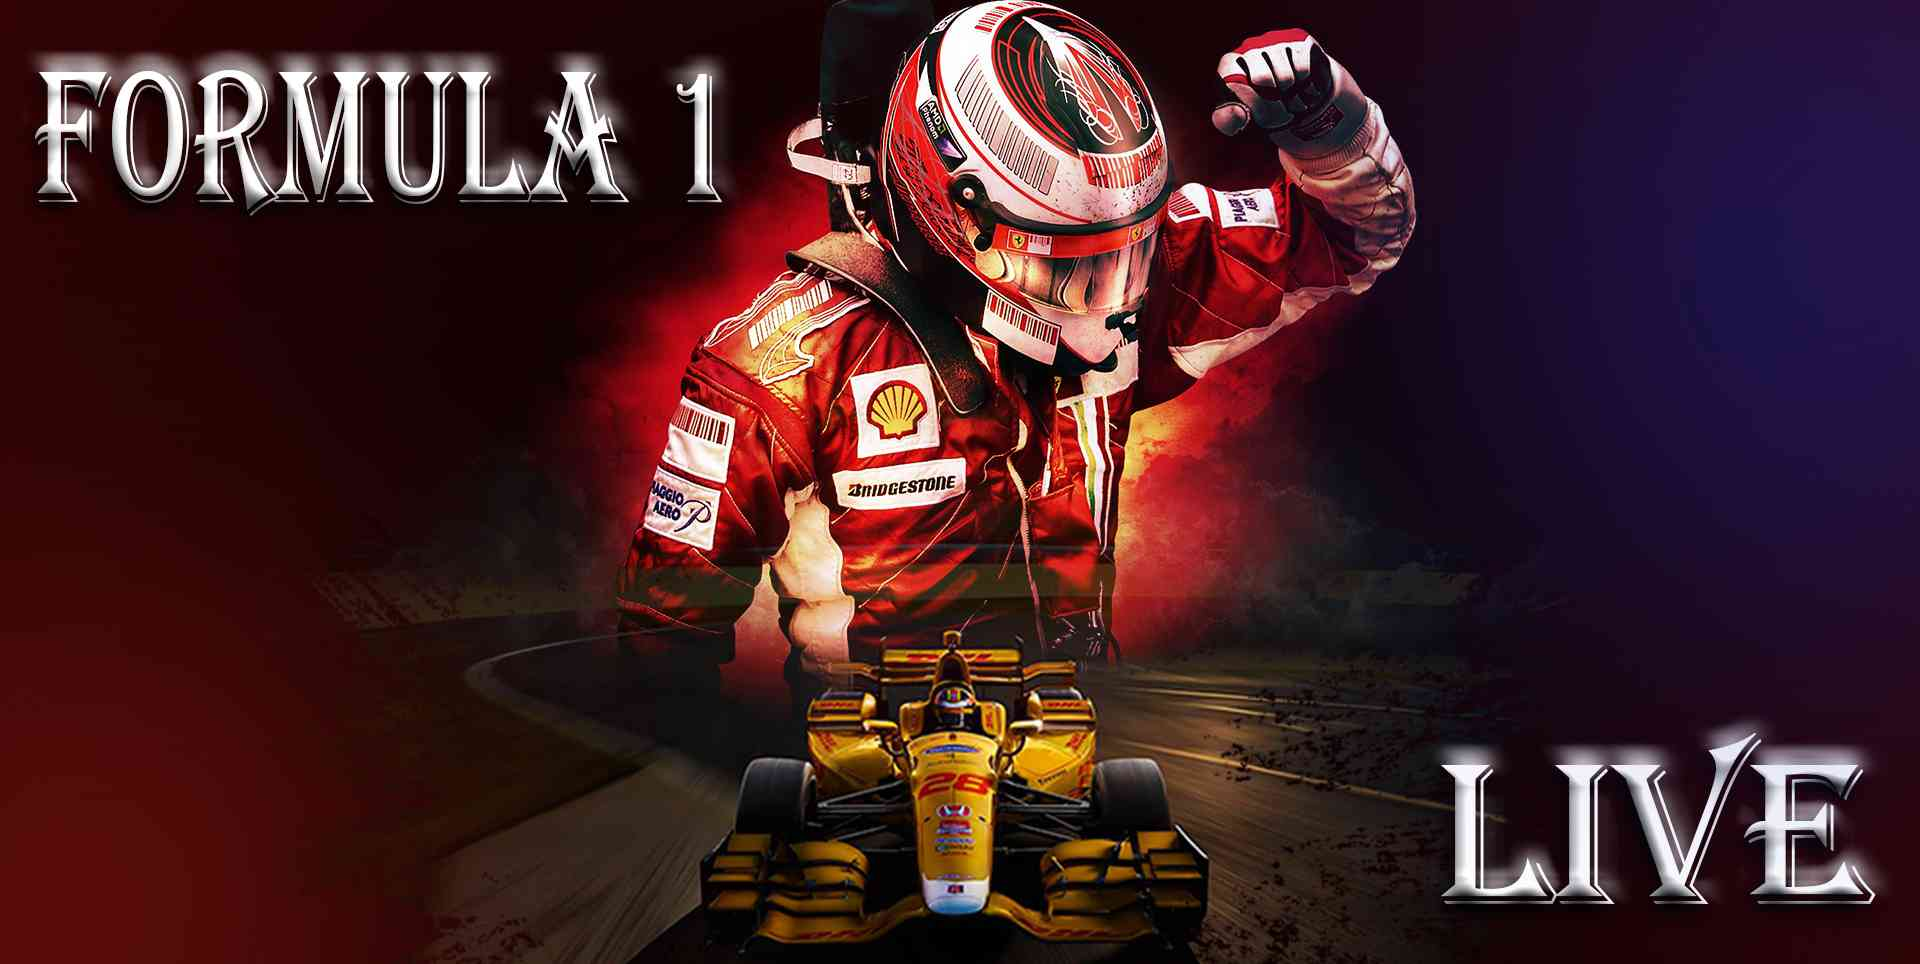 azerbaijan-formula-1-grand-prix-online